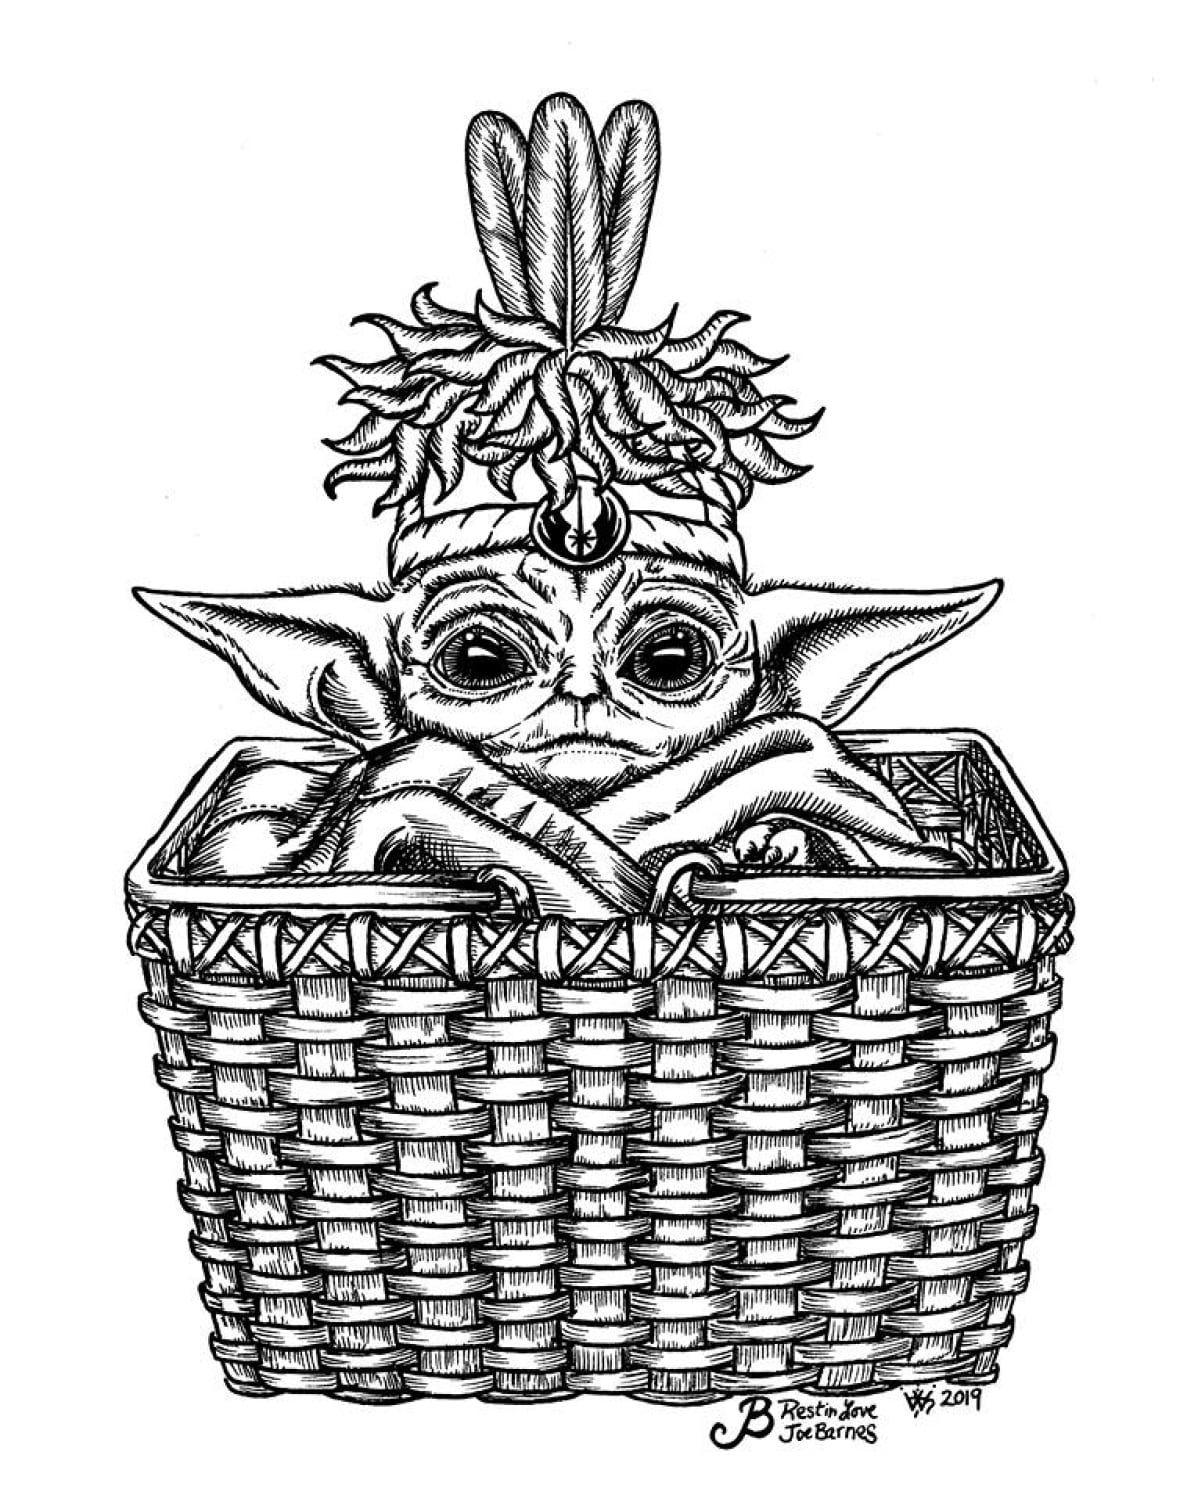 So Darn Cute Indigenous Artists And Memers Embrace Baby Yoda Cbc News Yoda Images Yoda Singer Art